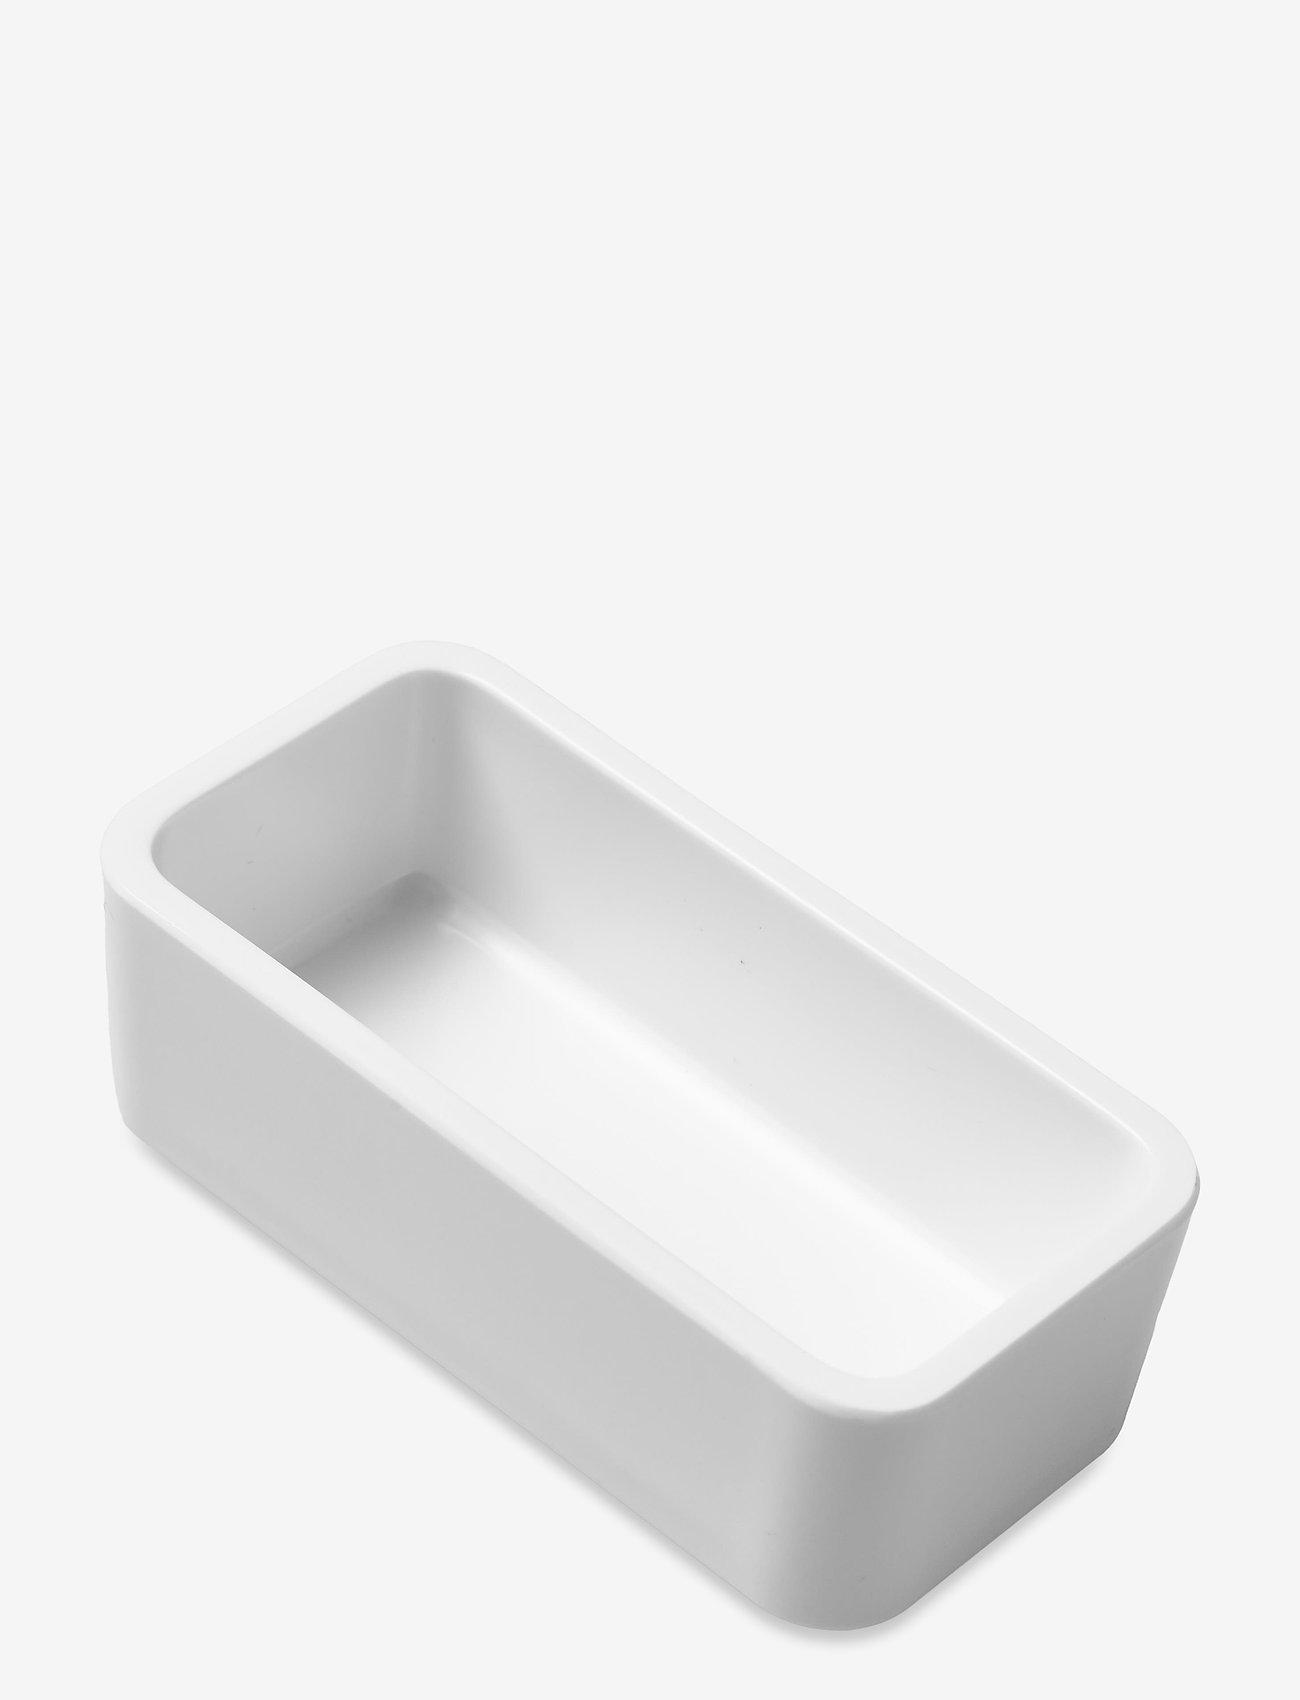 PANTONE - DIP BOWL XS WHITE 11-4800 - tarjoiluastiat ja -lautaset - white 11-4800 - 0